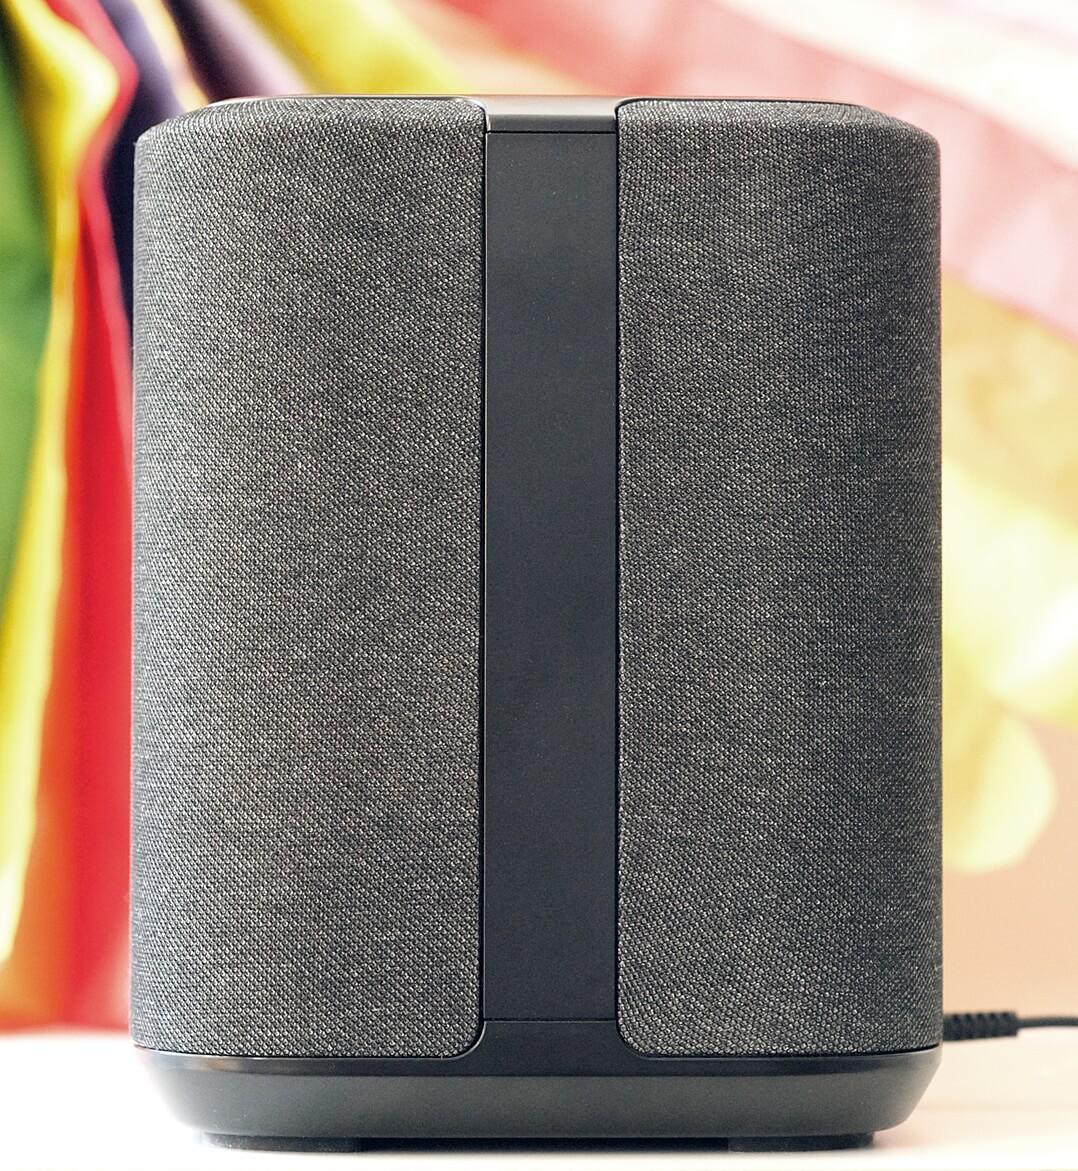 Denon Home 350 Streaming-Lautsprecher - seitlich